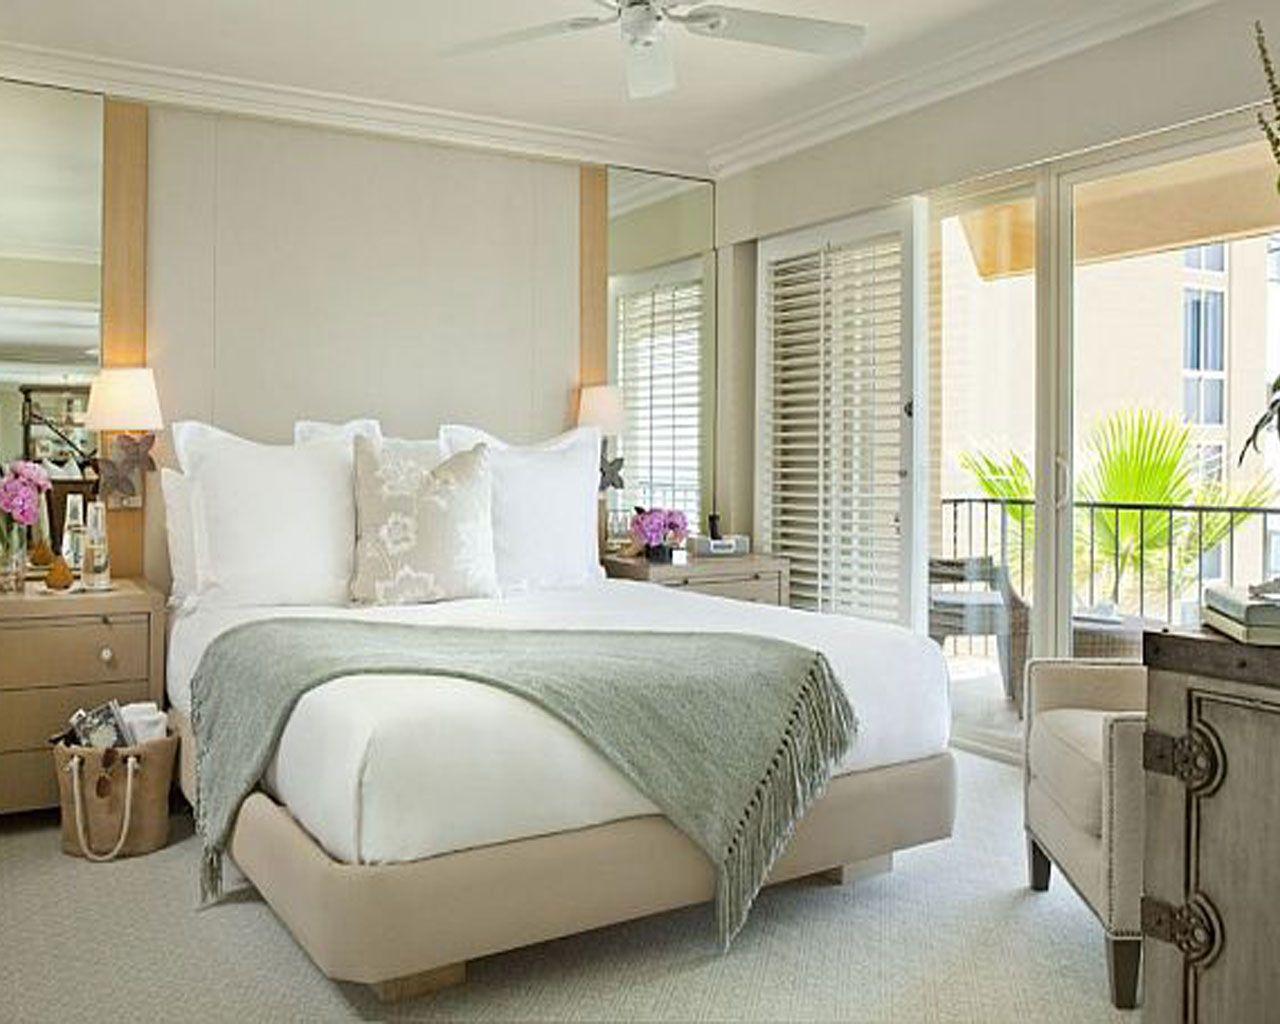 Charmant Elegant Bedroom Interior Design With White Furniture   Interior Cruz